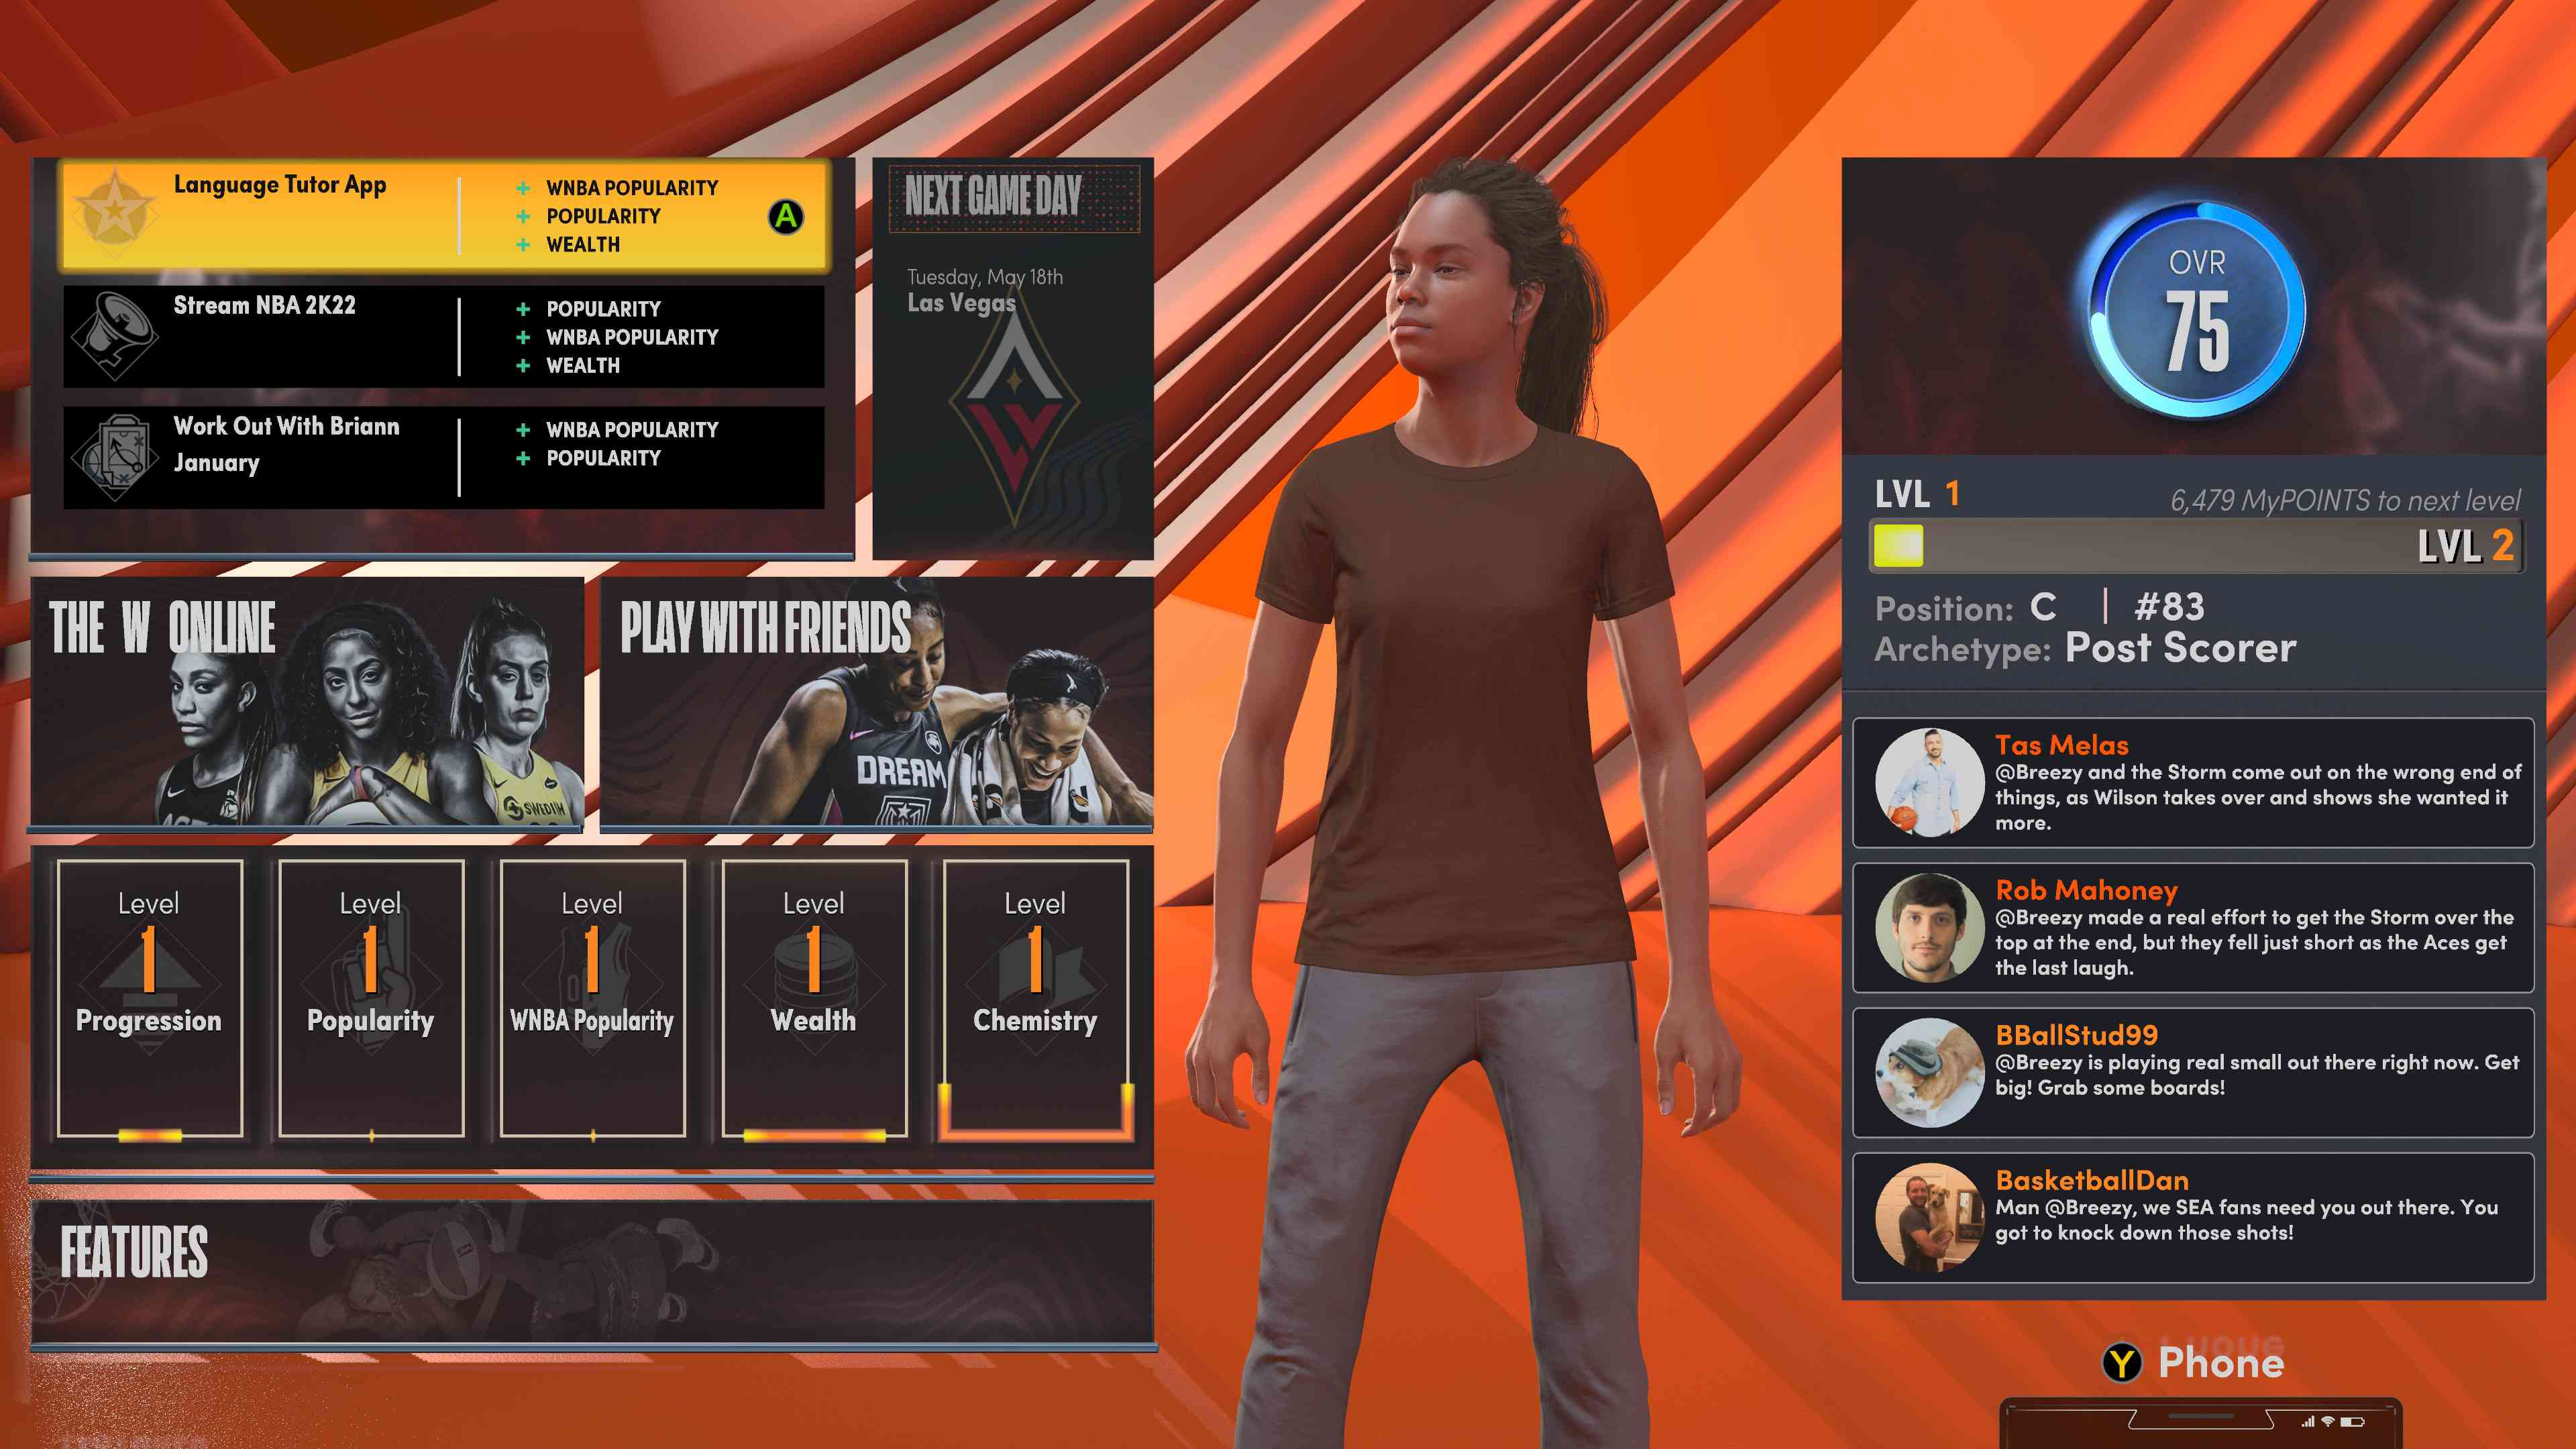 WNBA character stats screen in NBA 2K22